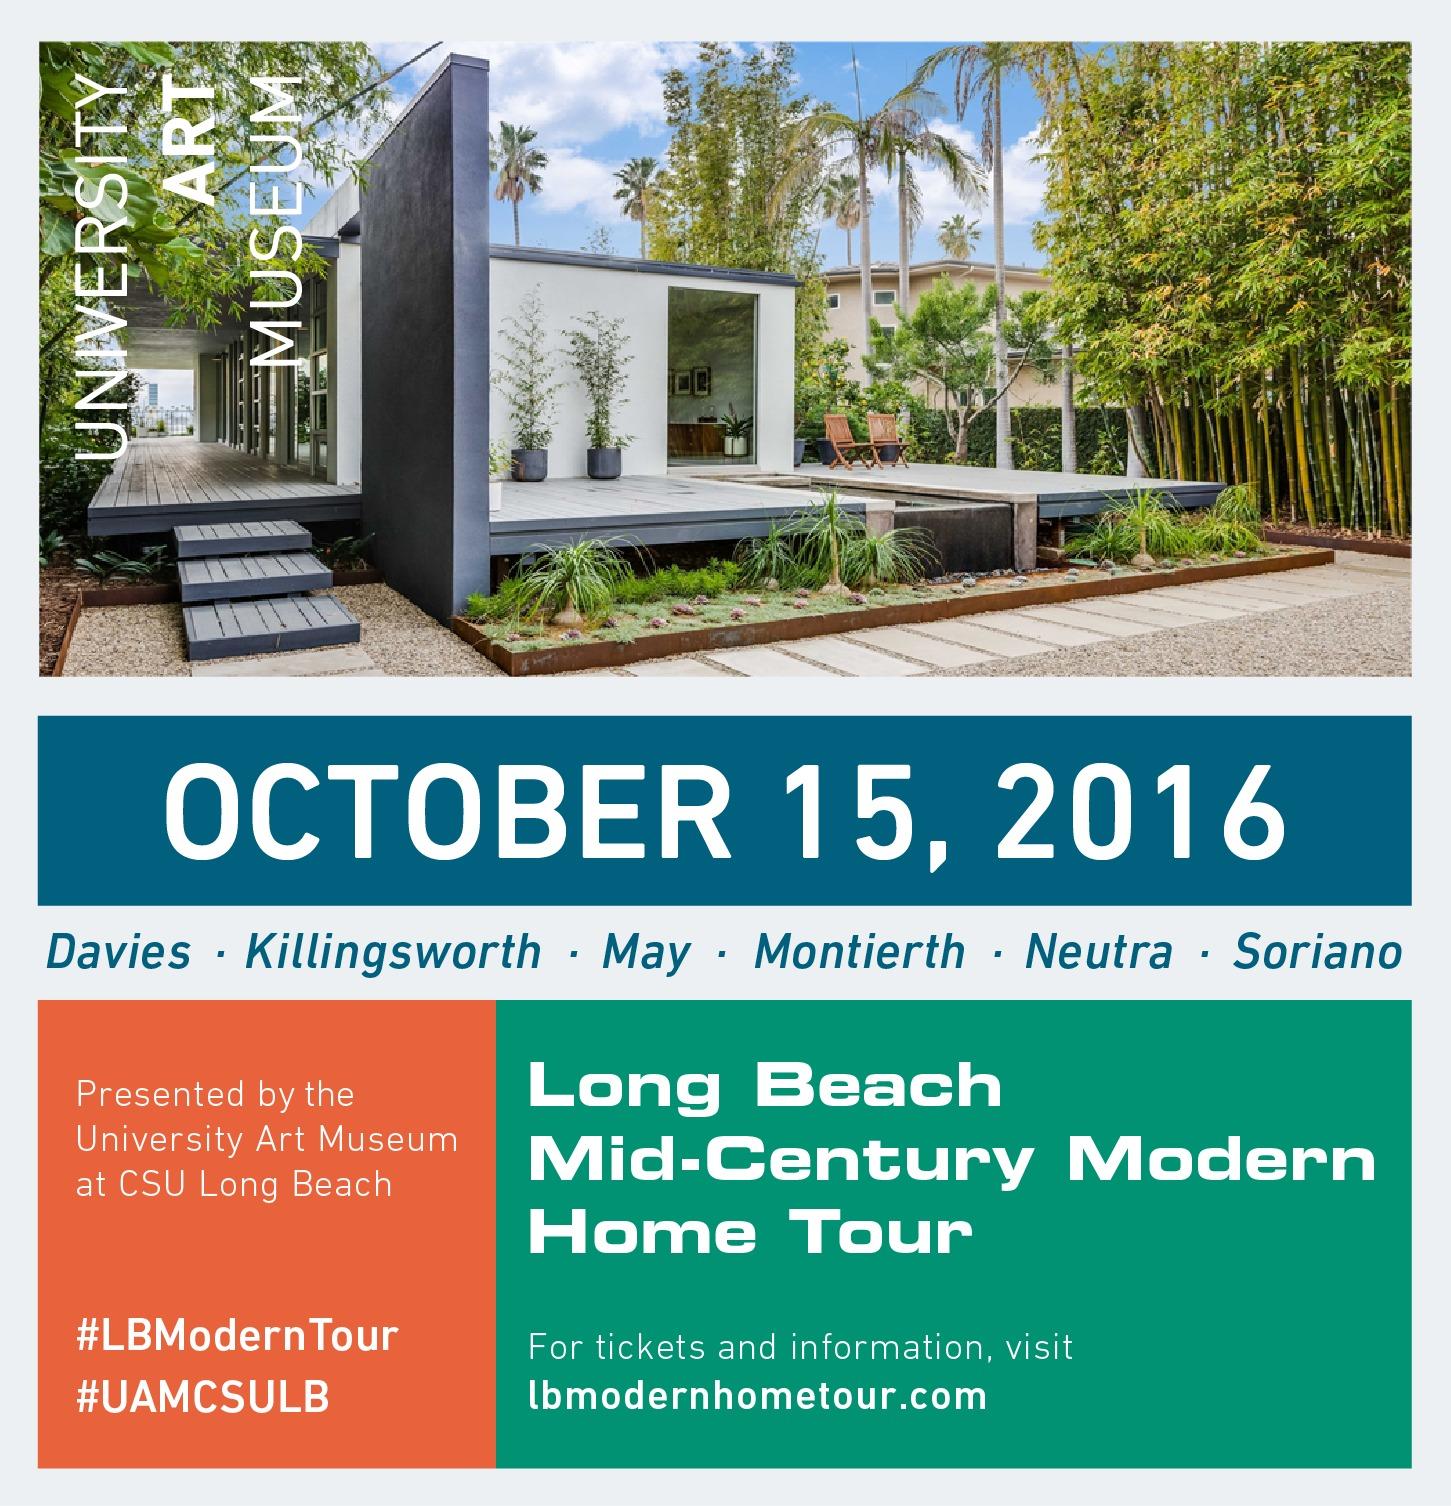 Long beach mid century modern home tour archdaily for Big modern house tour